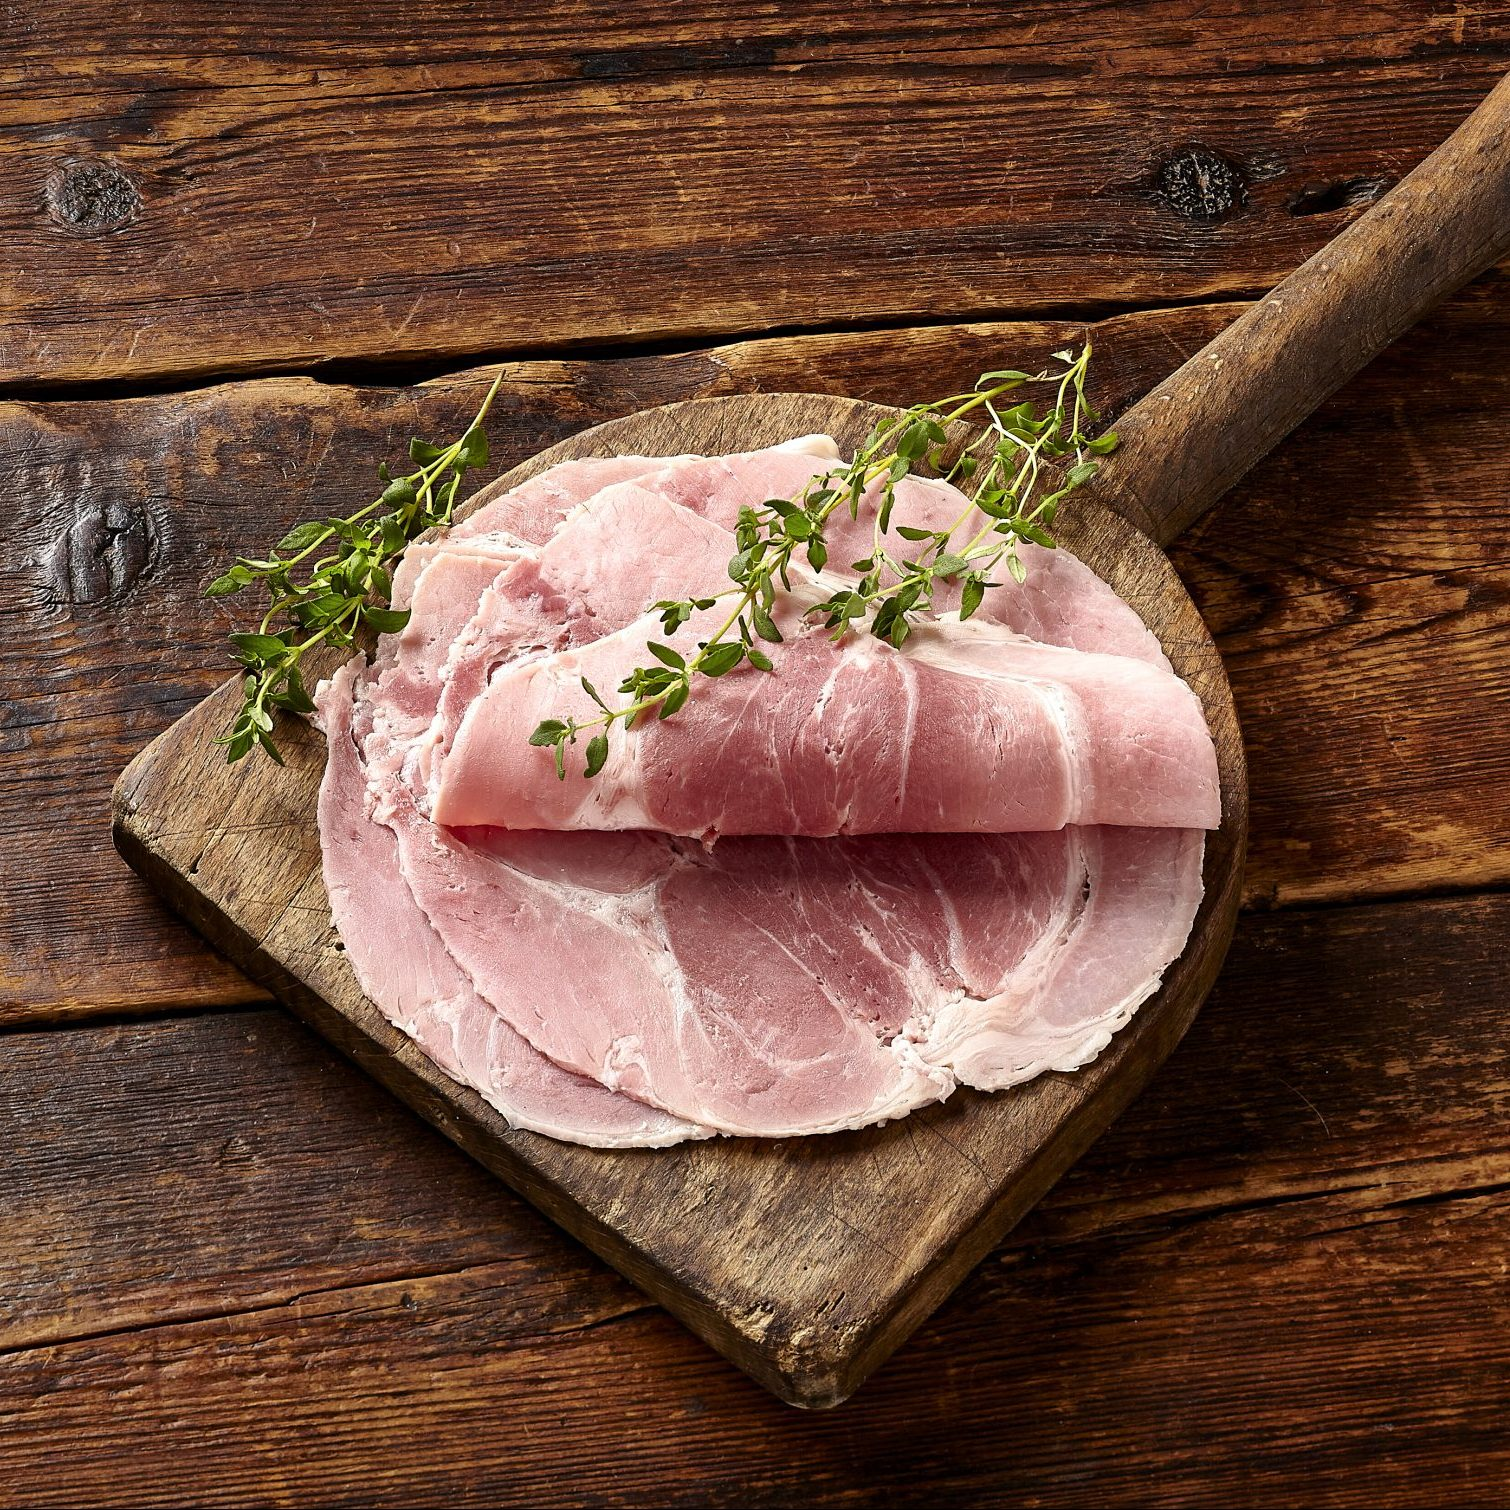 Organic Dry Cured Ham